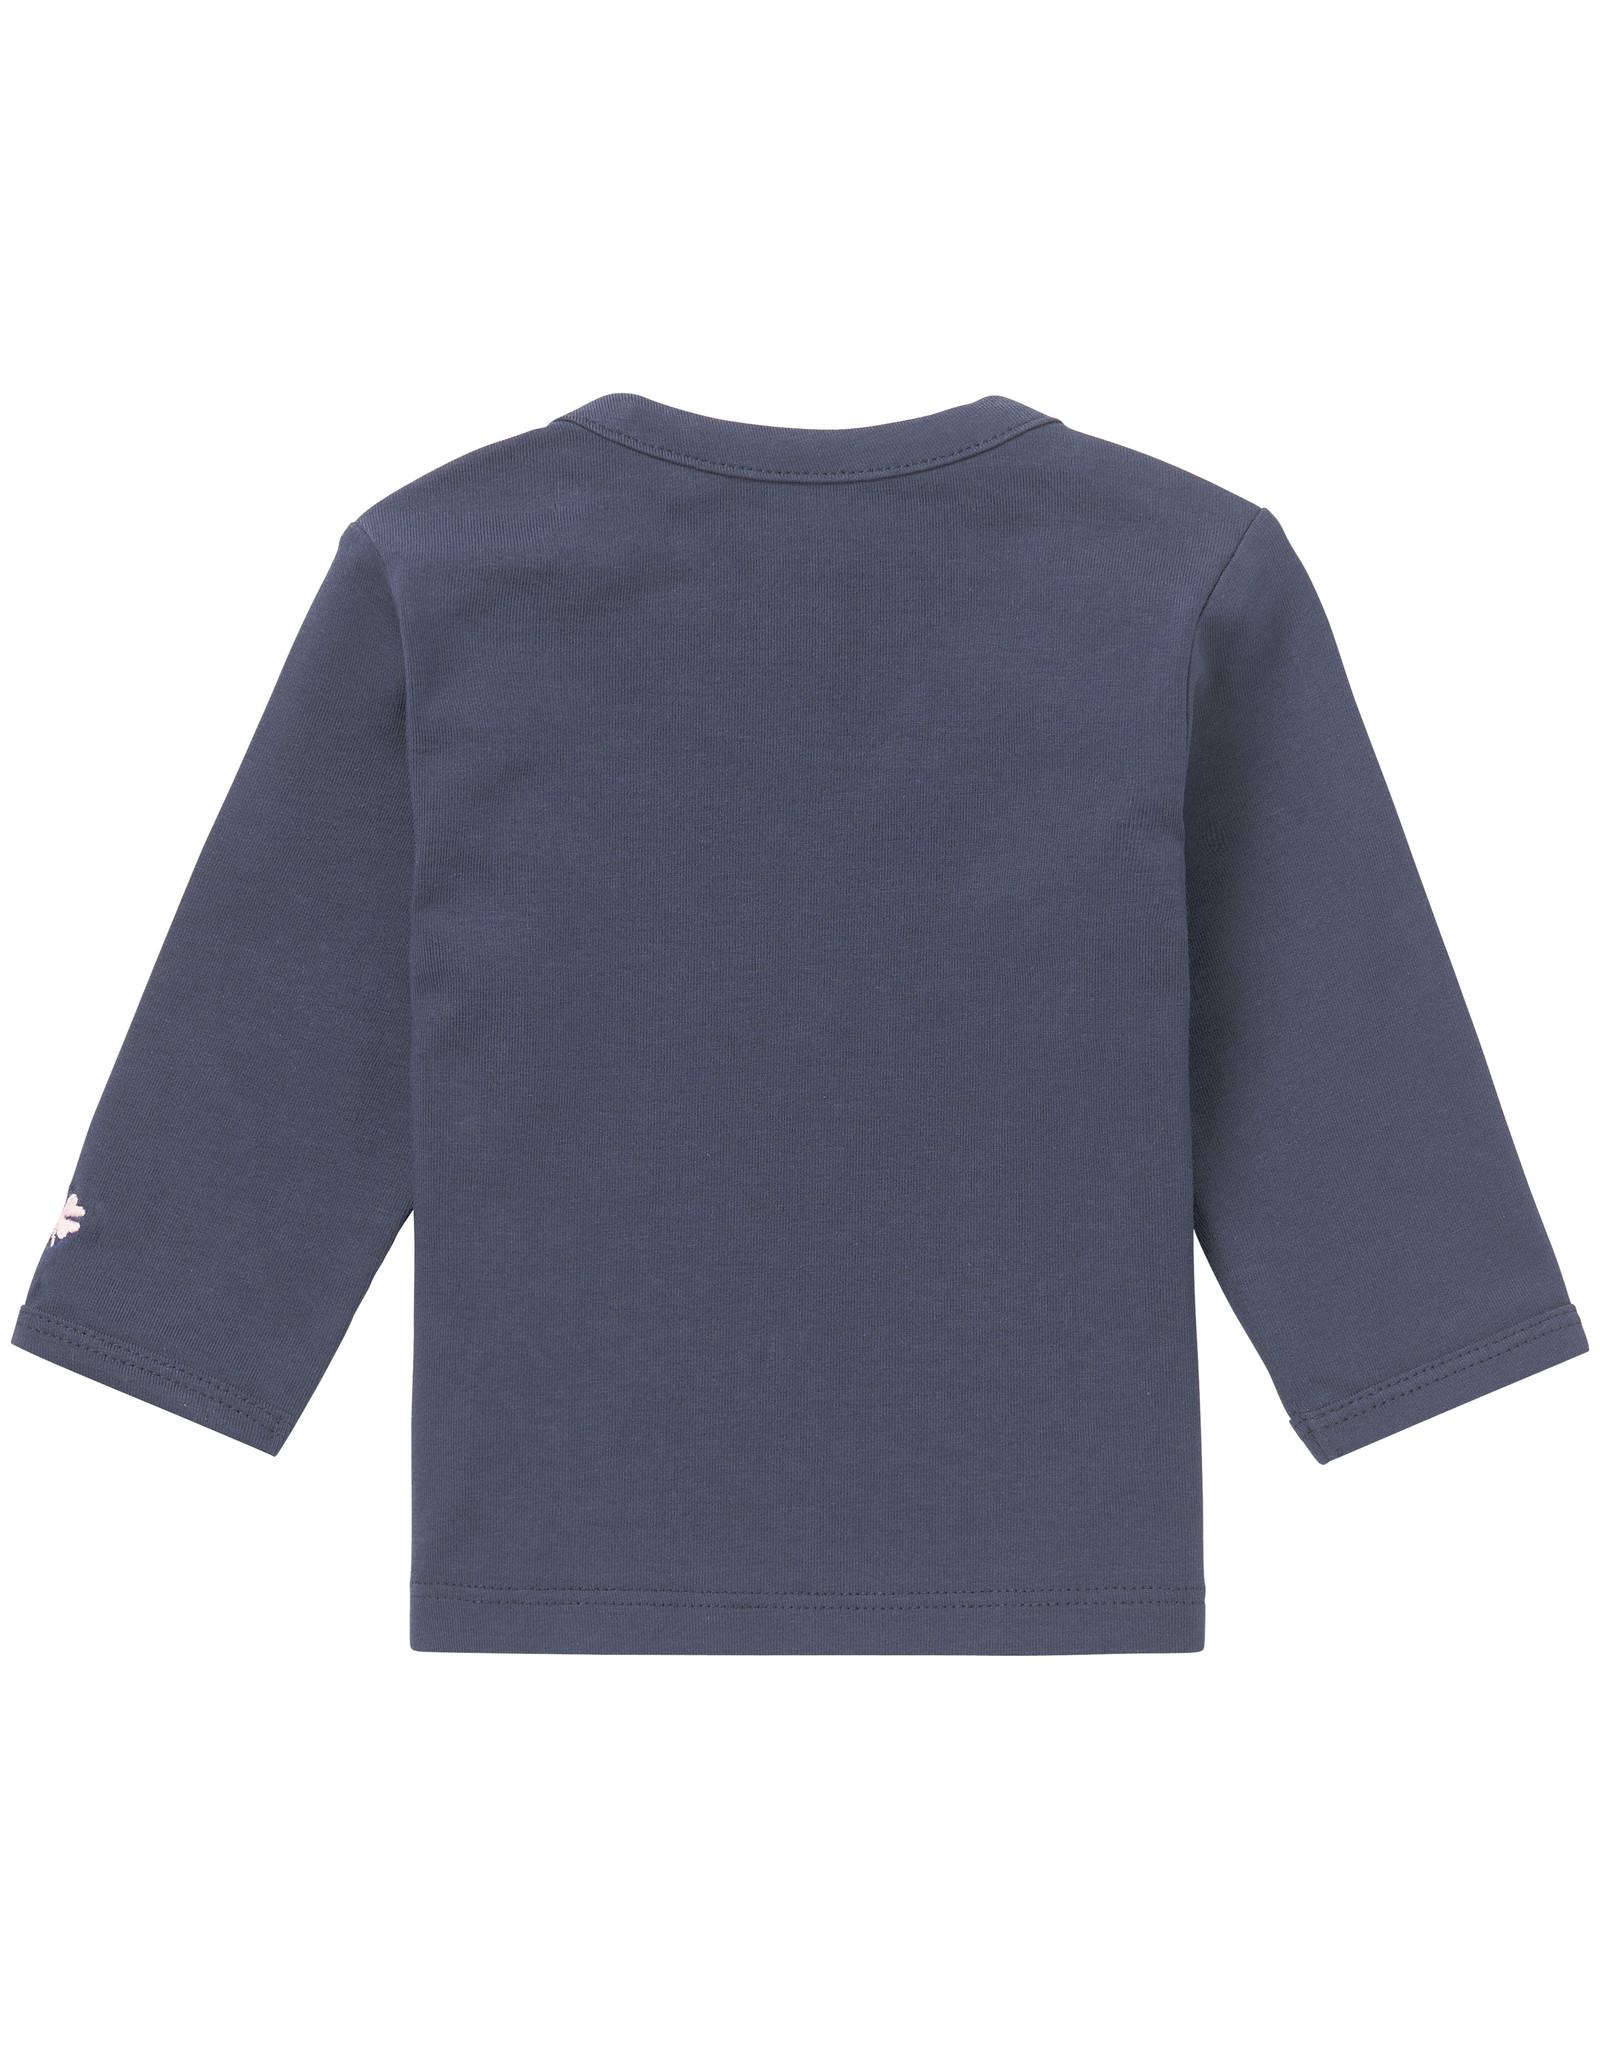 Noppies Shirt Natick